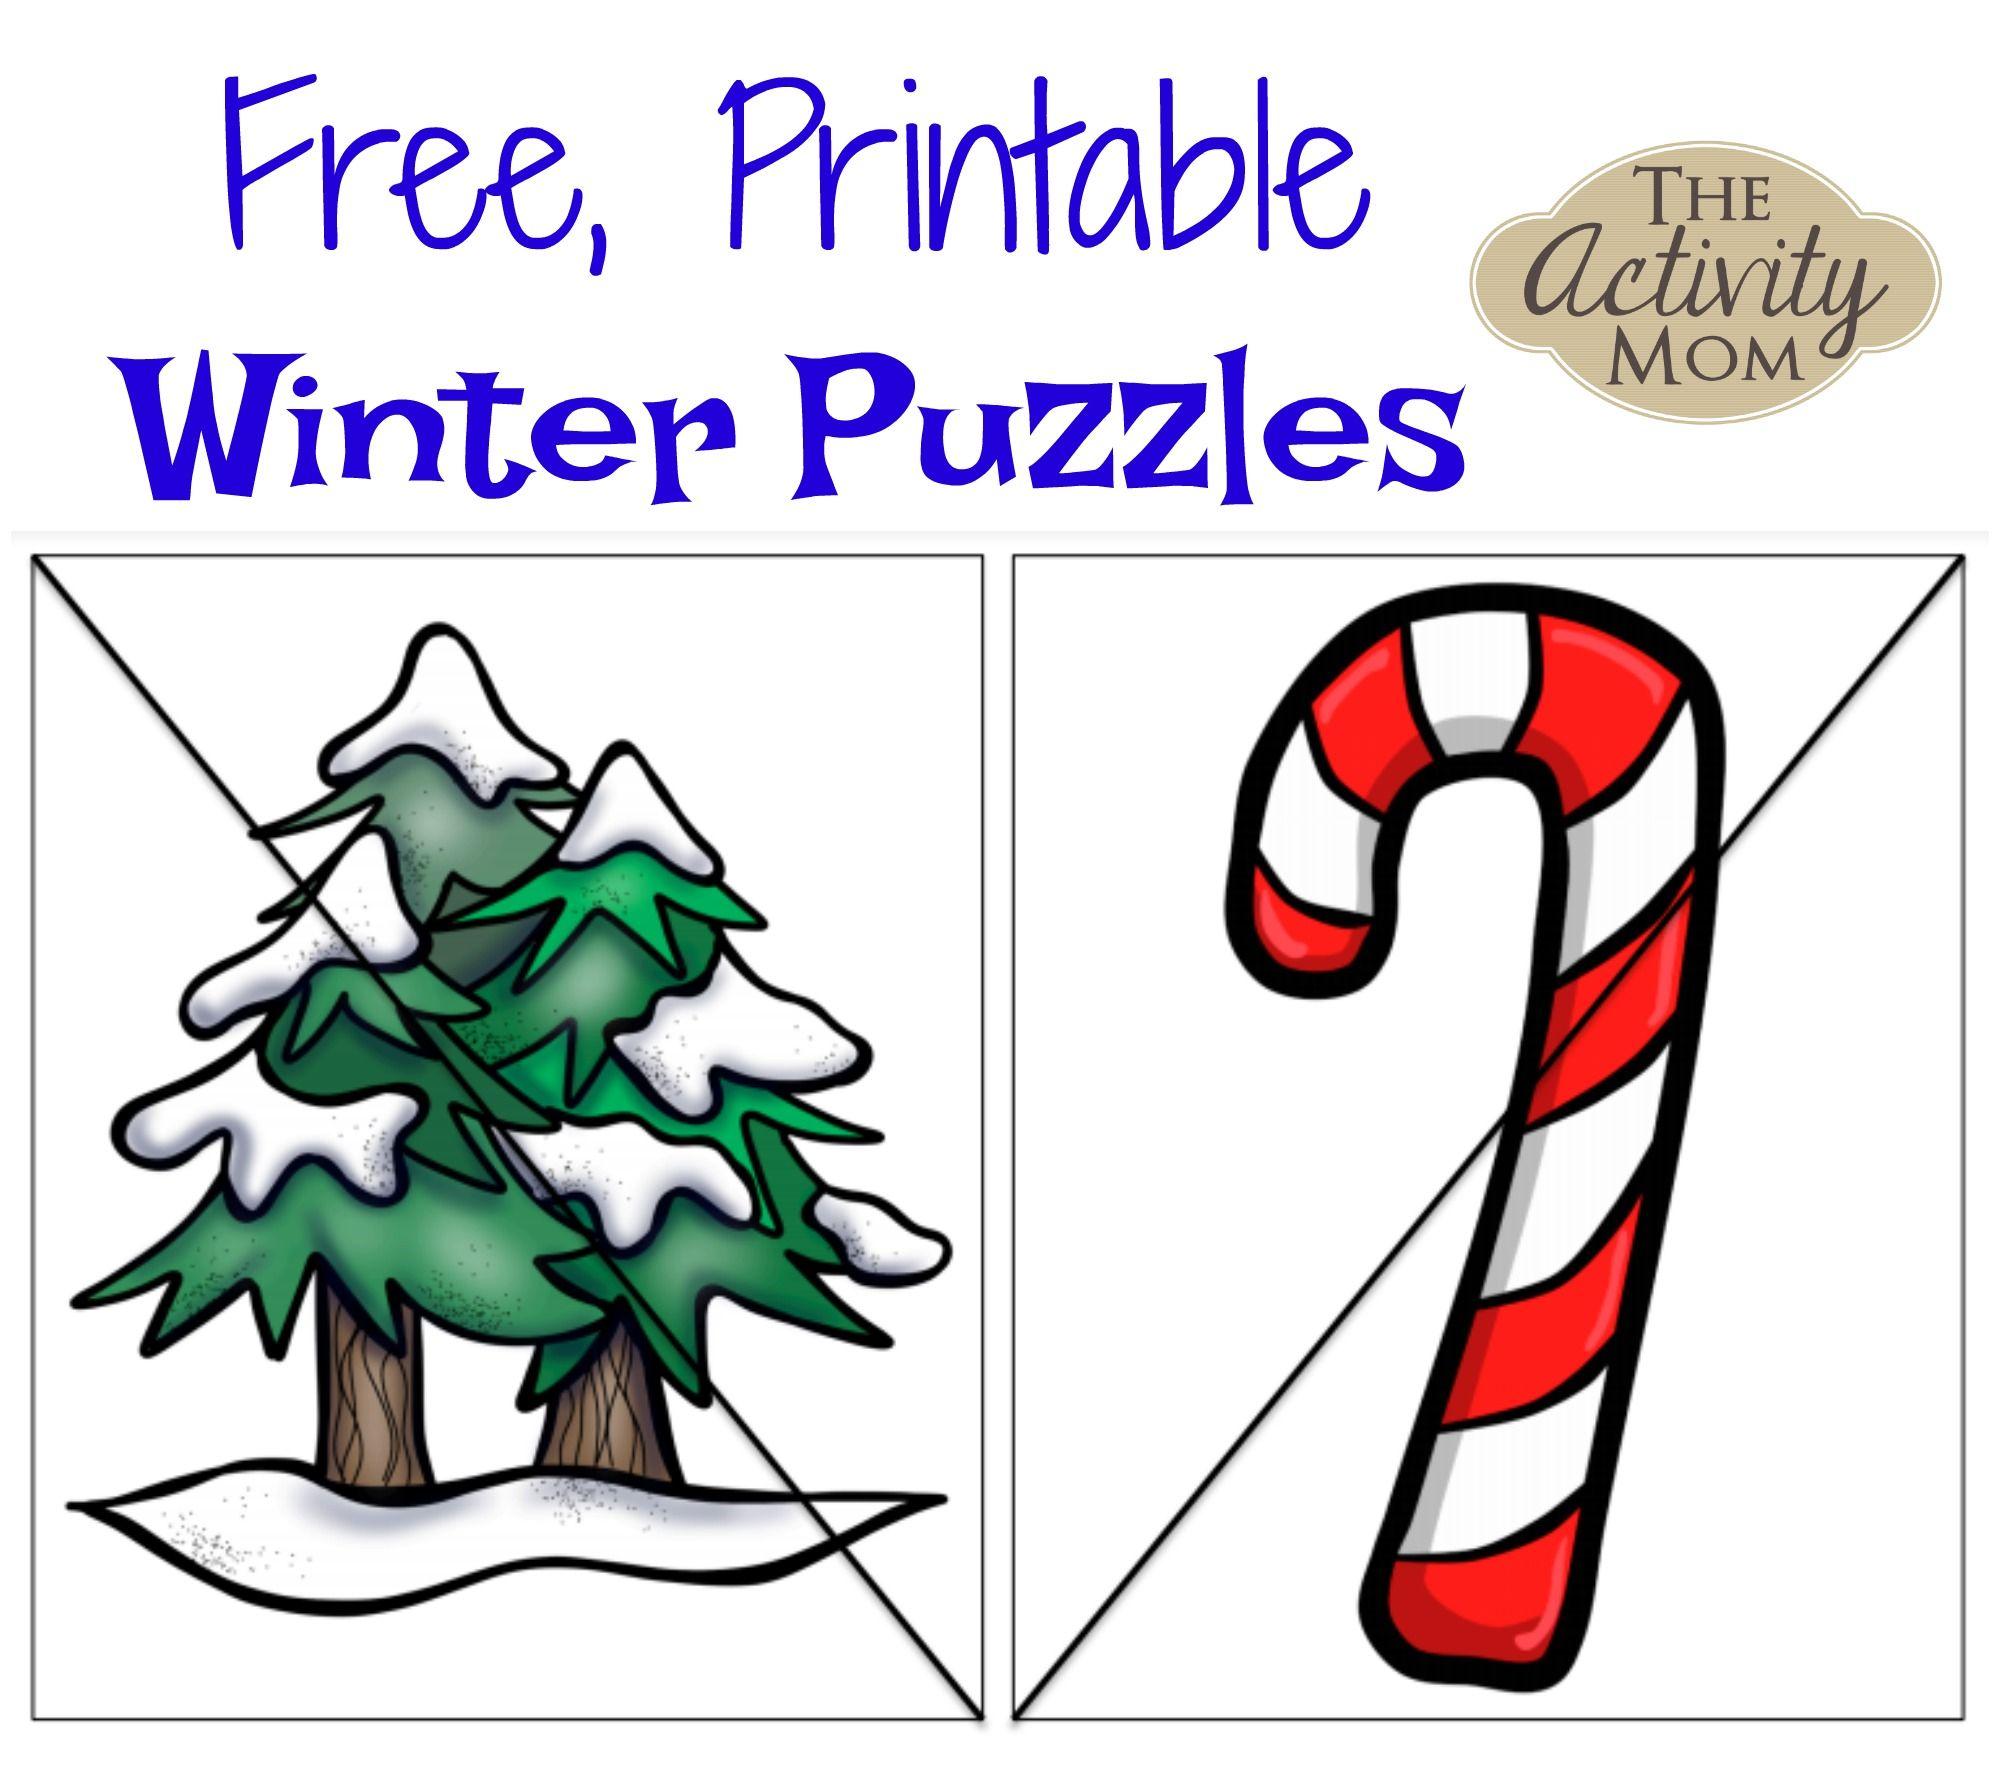 Free Printable Winter Puzzles | Pinterest